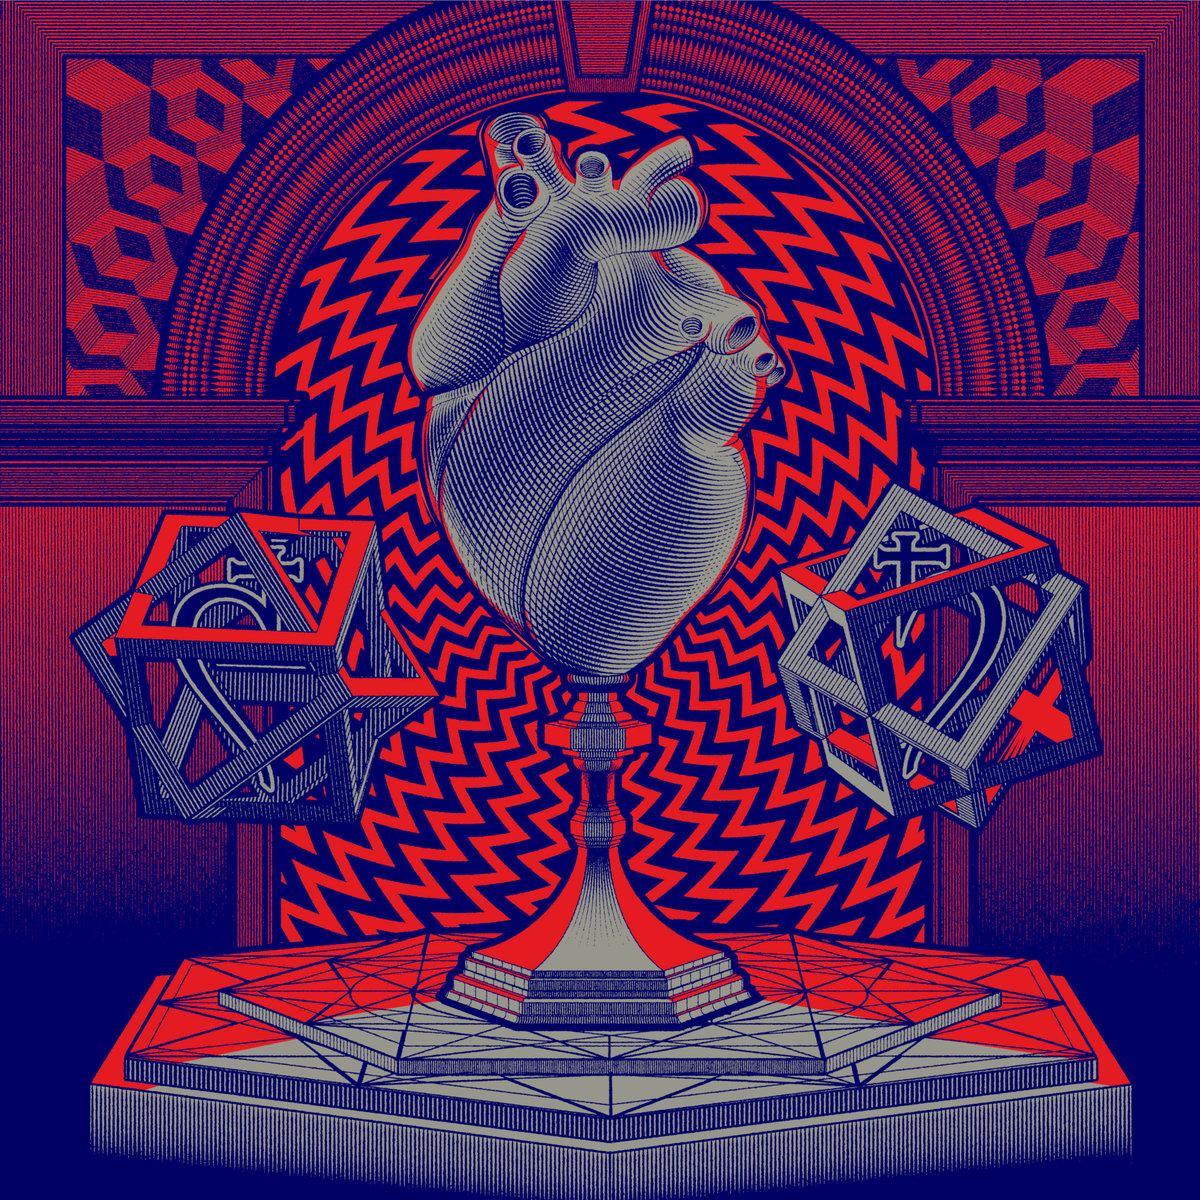 Kaleikr-Heart-Of-Lead